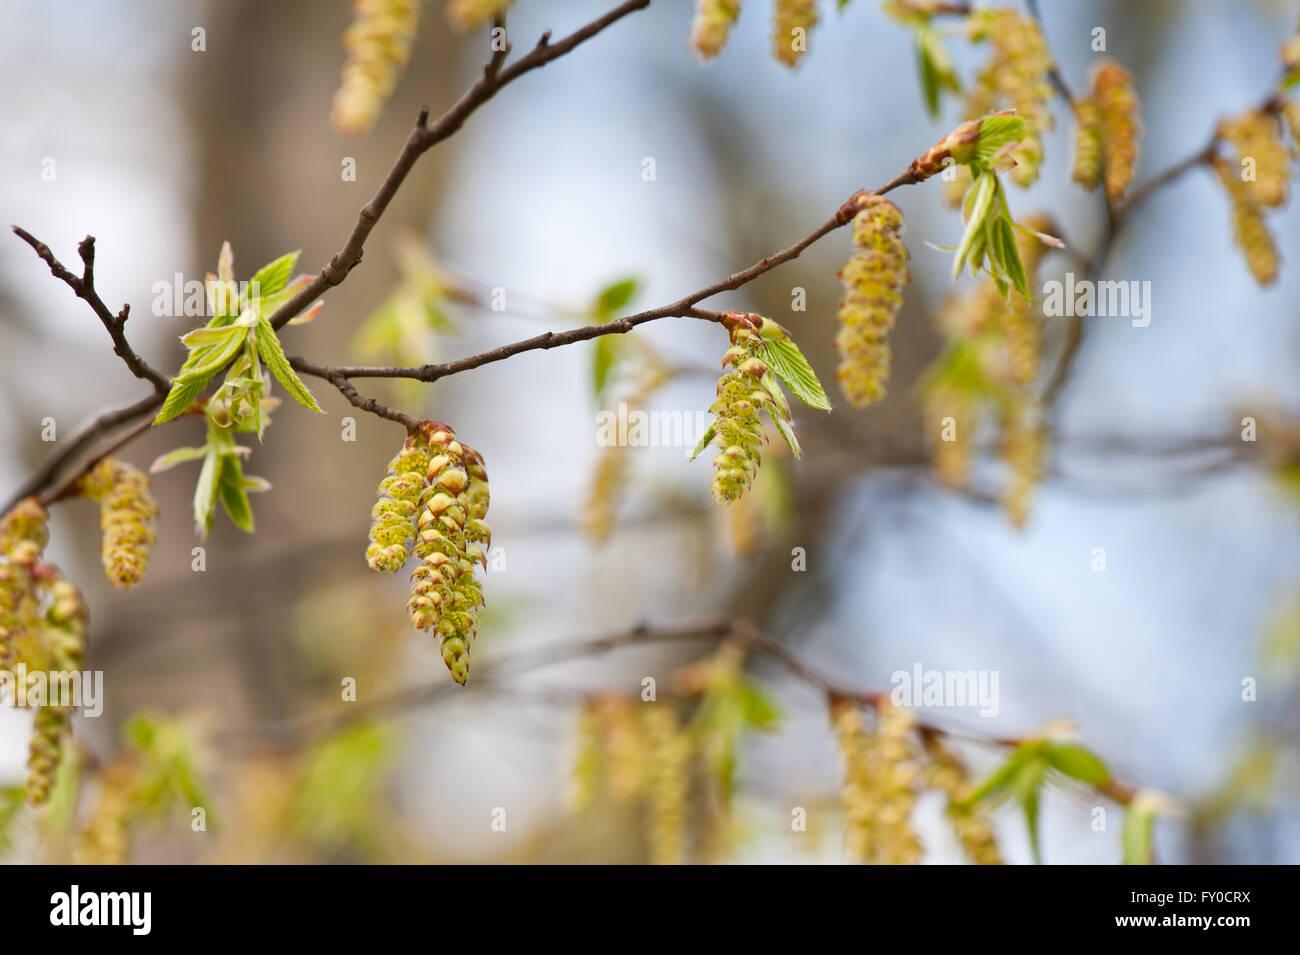 Carpinus betulus tree flowering macro, drooping young hornbeam catkins inflorescences nature detail, fresh flowering - Stock Image